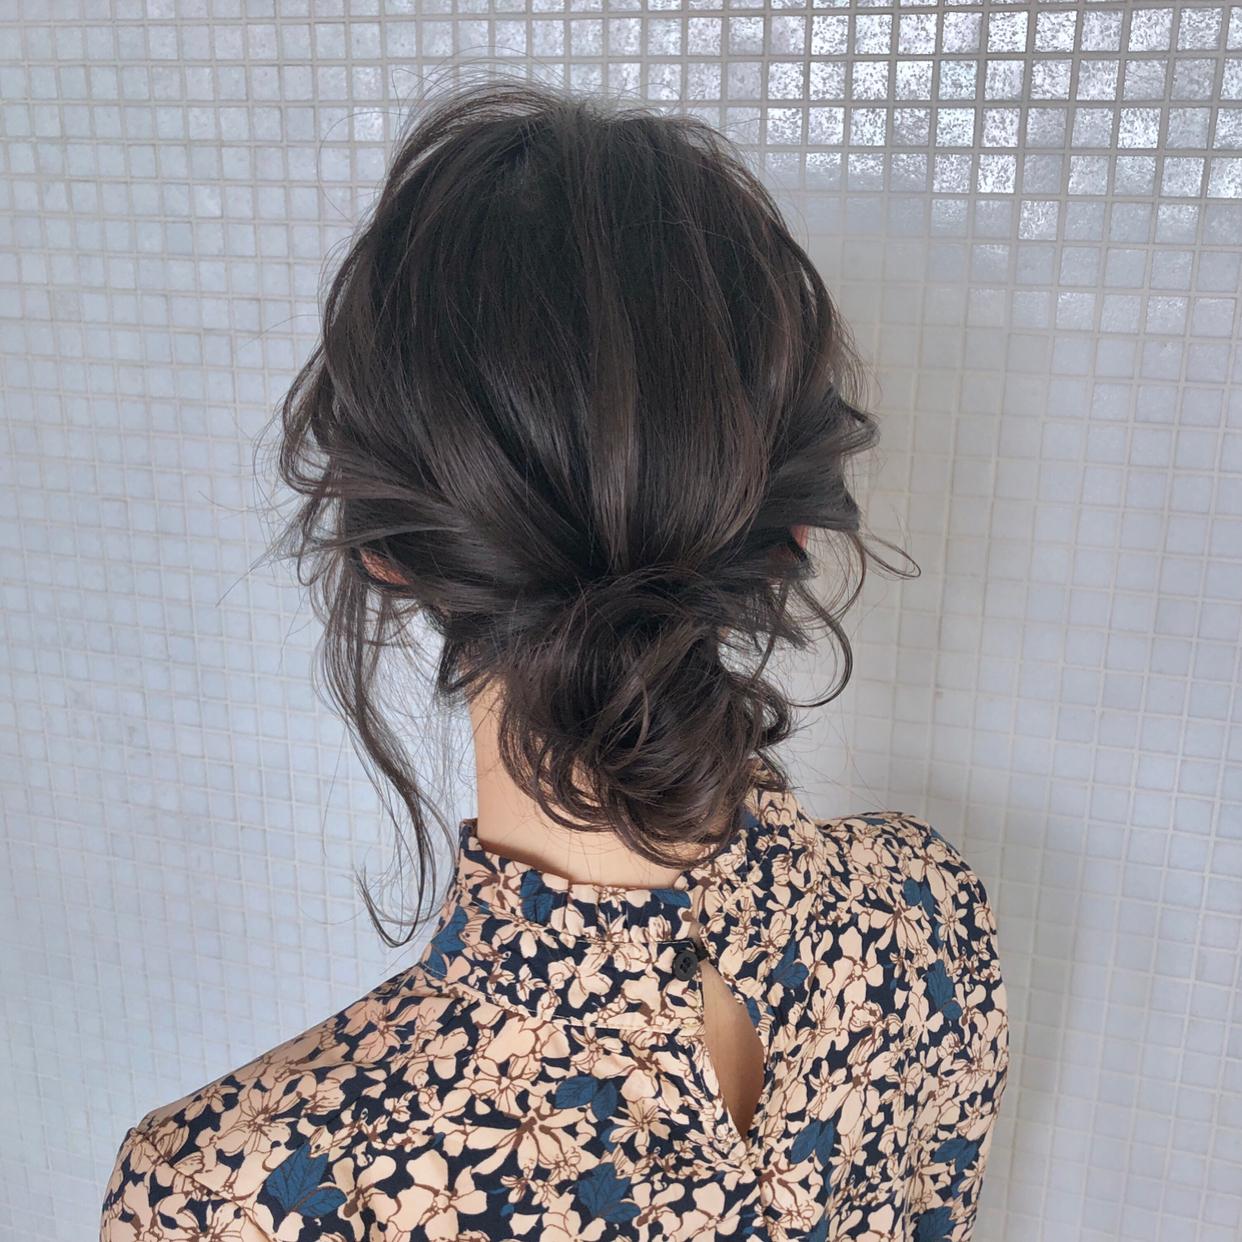 kawamura_takashi_cam ネジネジお団子ヘア ヘアアレンジ&ヘアセット 河村タカシ #hairarrangecam #hairarrange #hairset #hair #ヘアアレンジ #へアセット #ヘア #関西 #大阪 #心斎橋 #hairdresser #美容師 #サロンモデル募集 #サロモ #おくれ毛 #簡単ヘアアレンジ